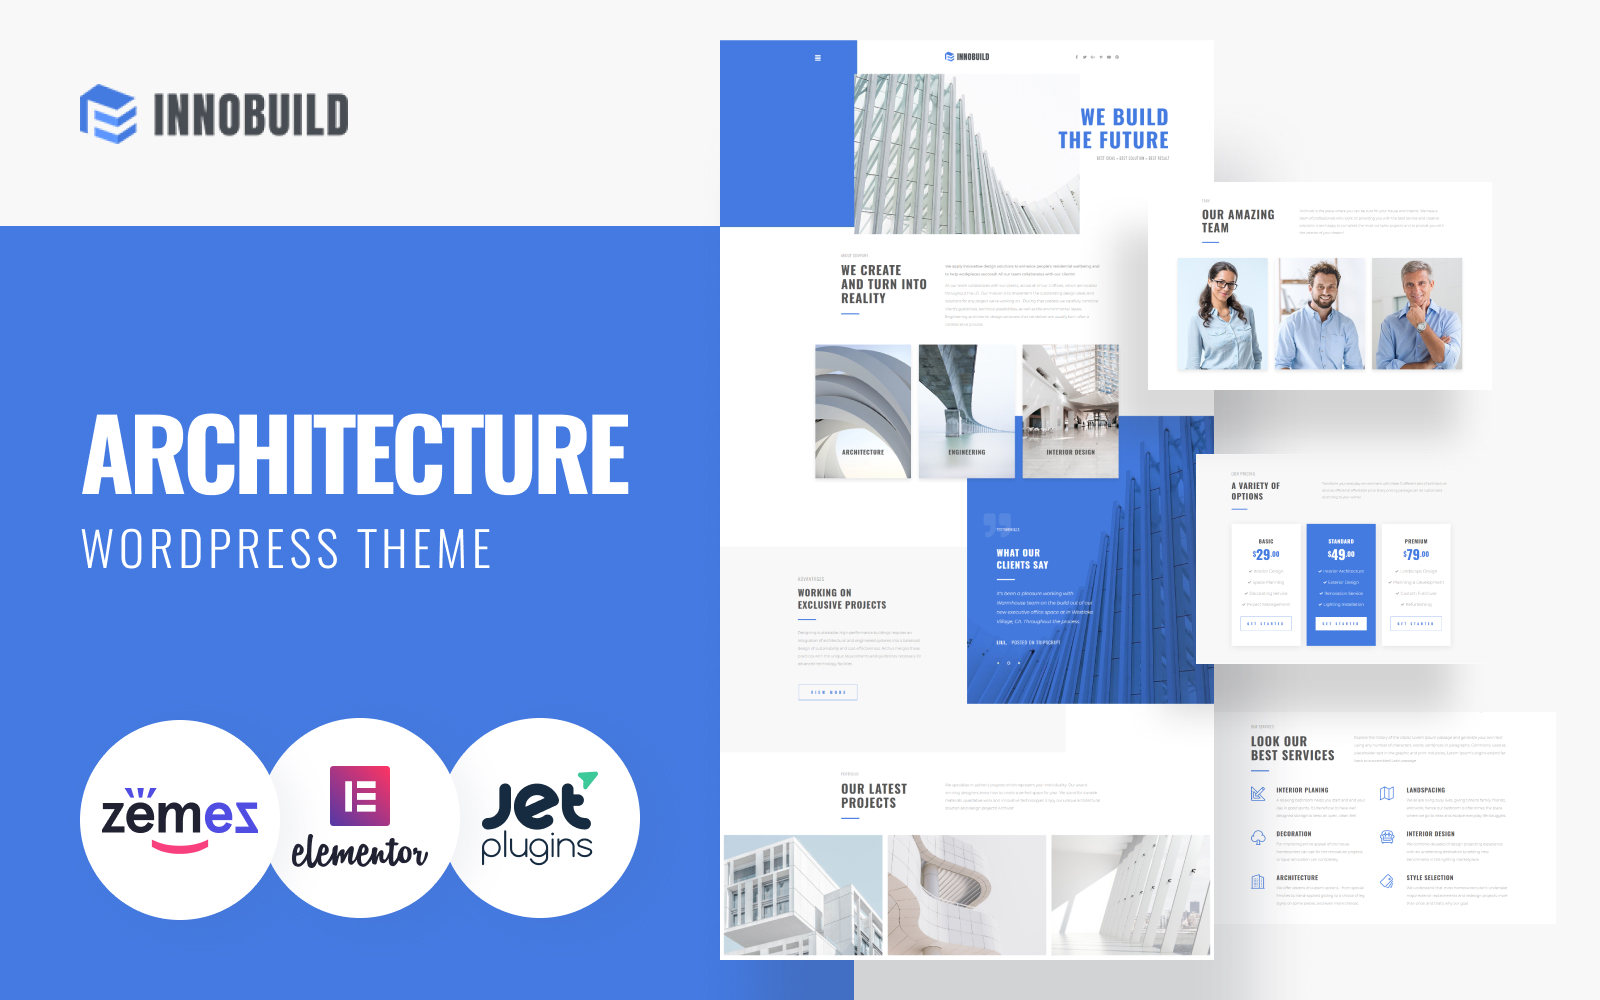 Responsivt Innobuild - Solid And Reliable Architecture Design WordPress-tema #73628